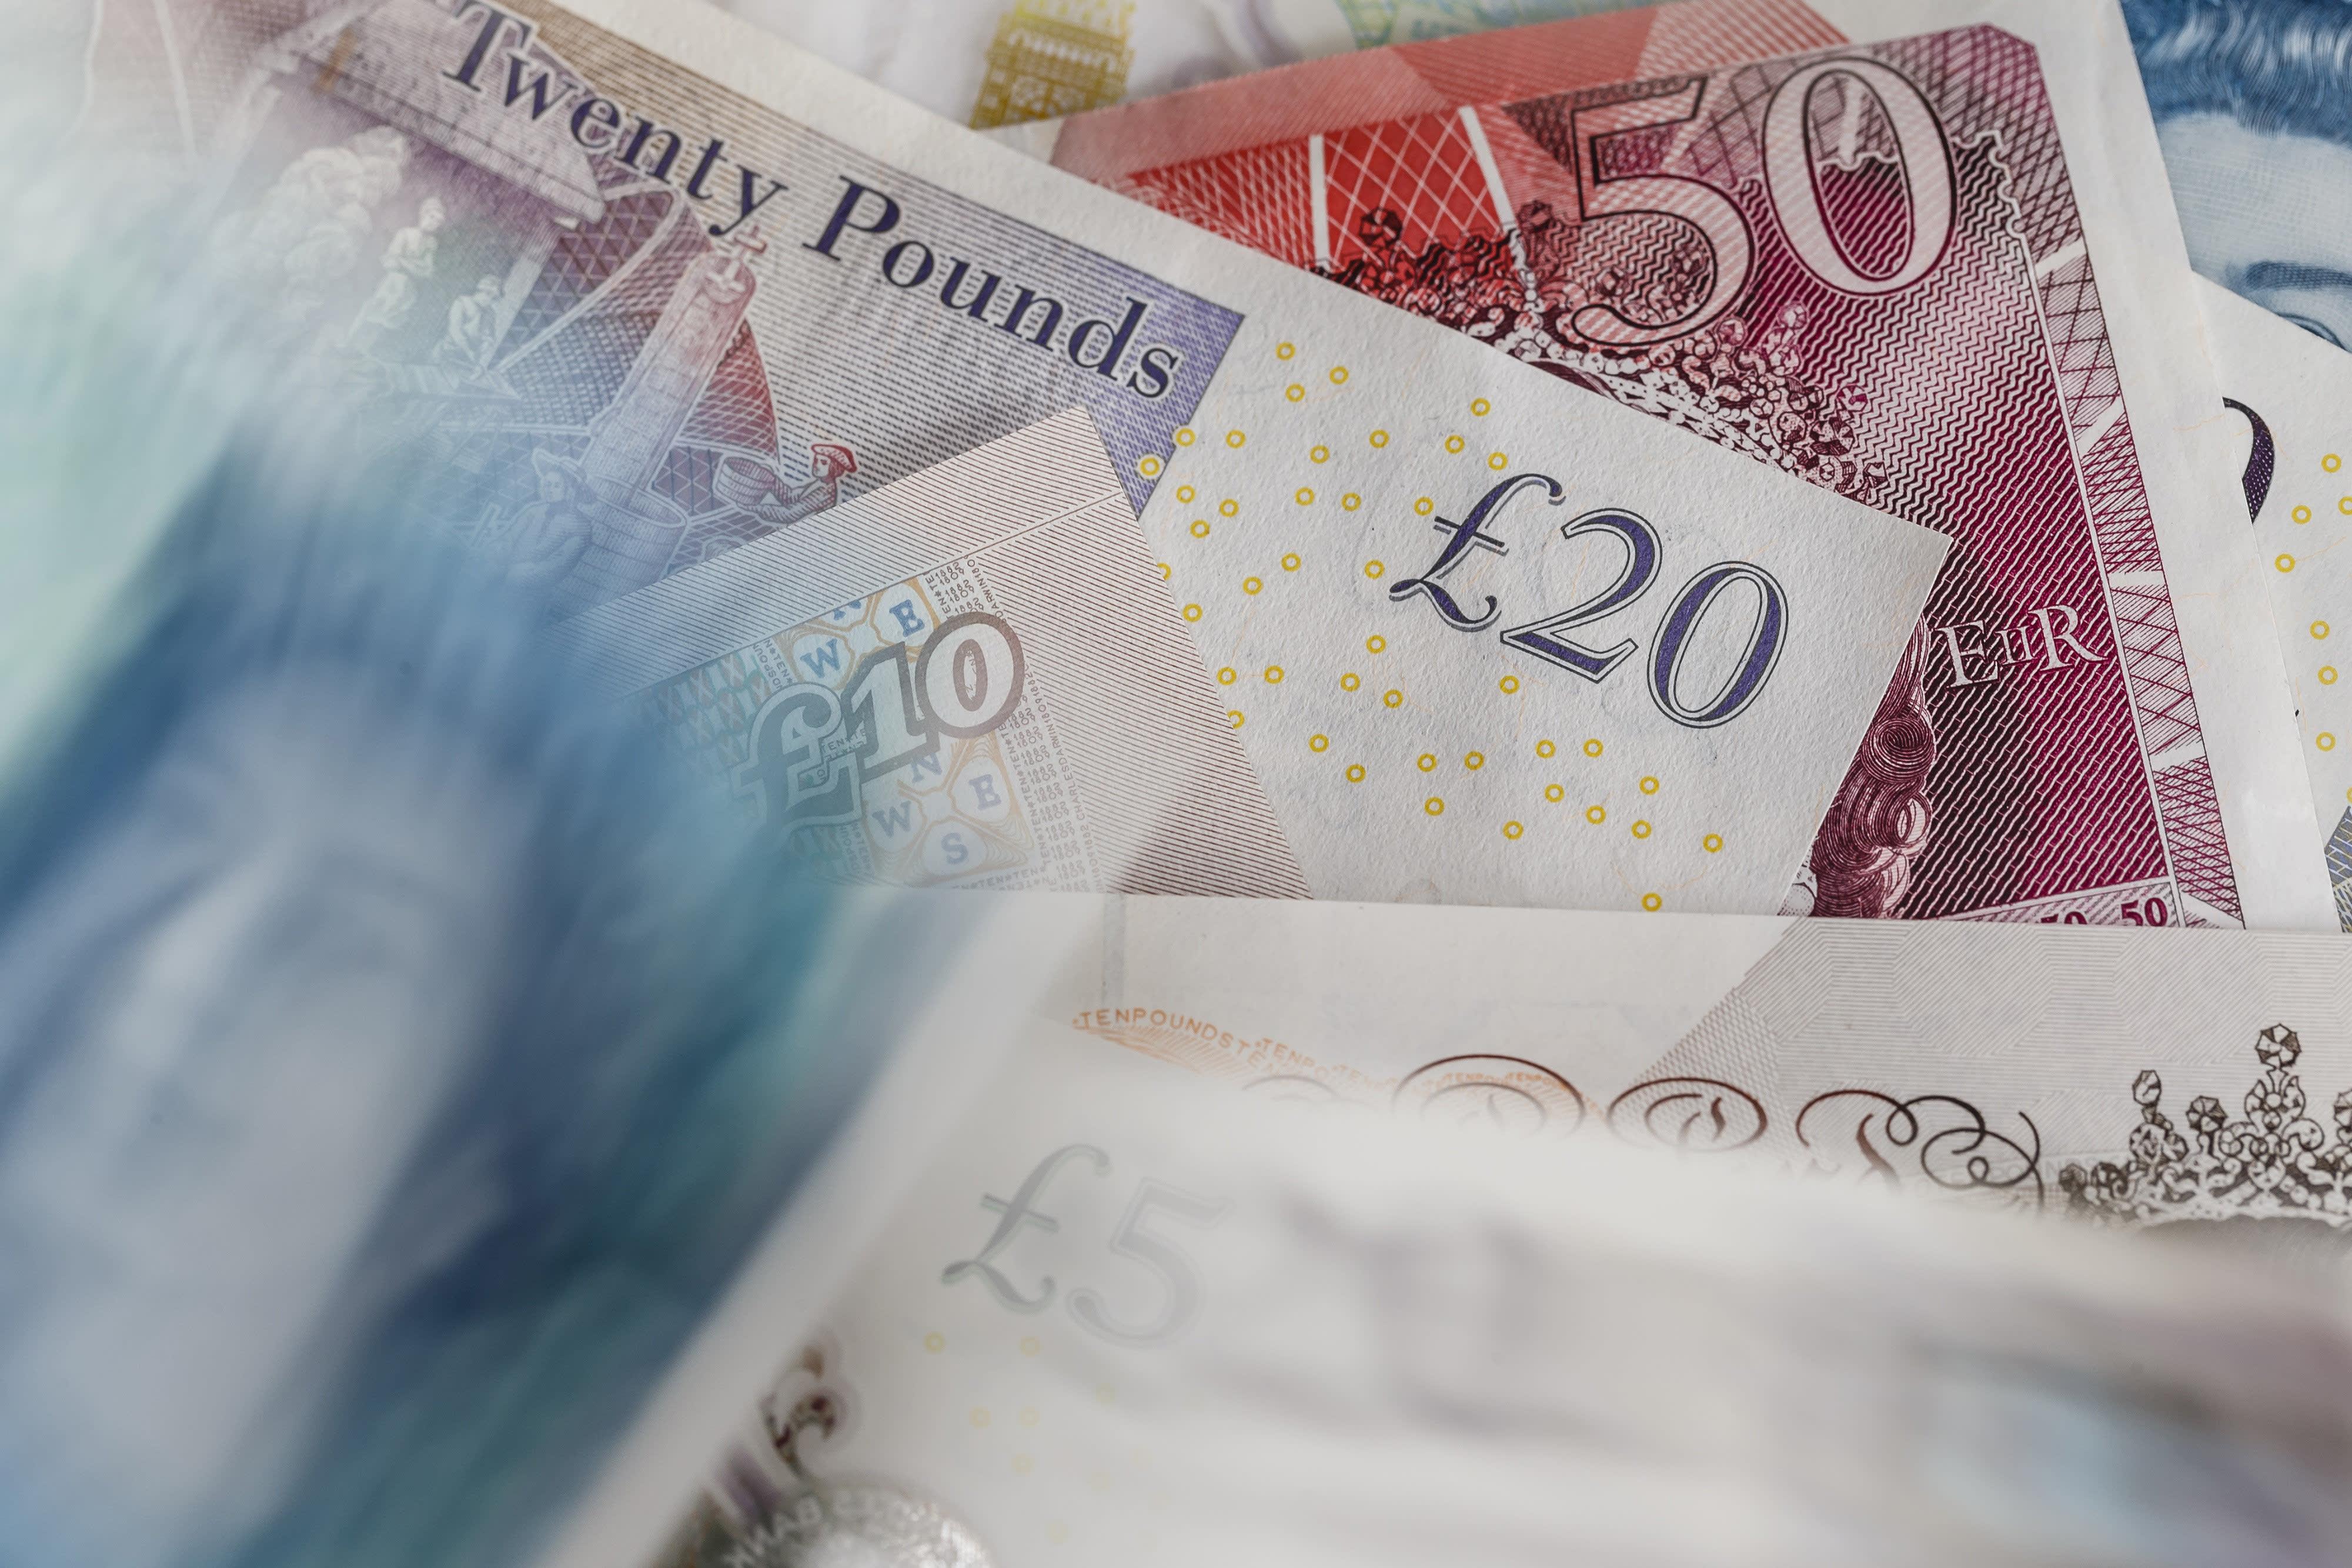 Claims head to FSCS as mini-bond firms go bust